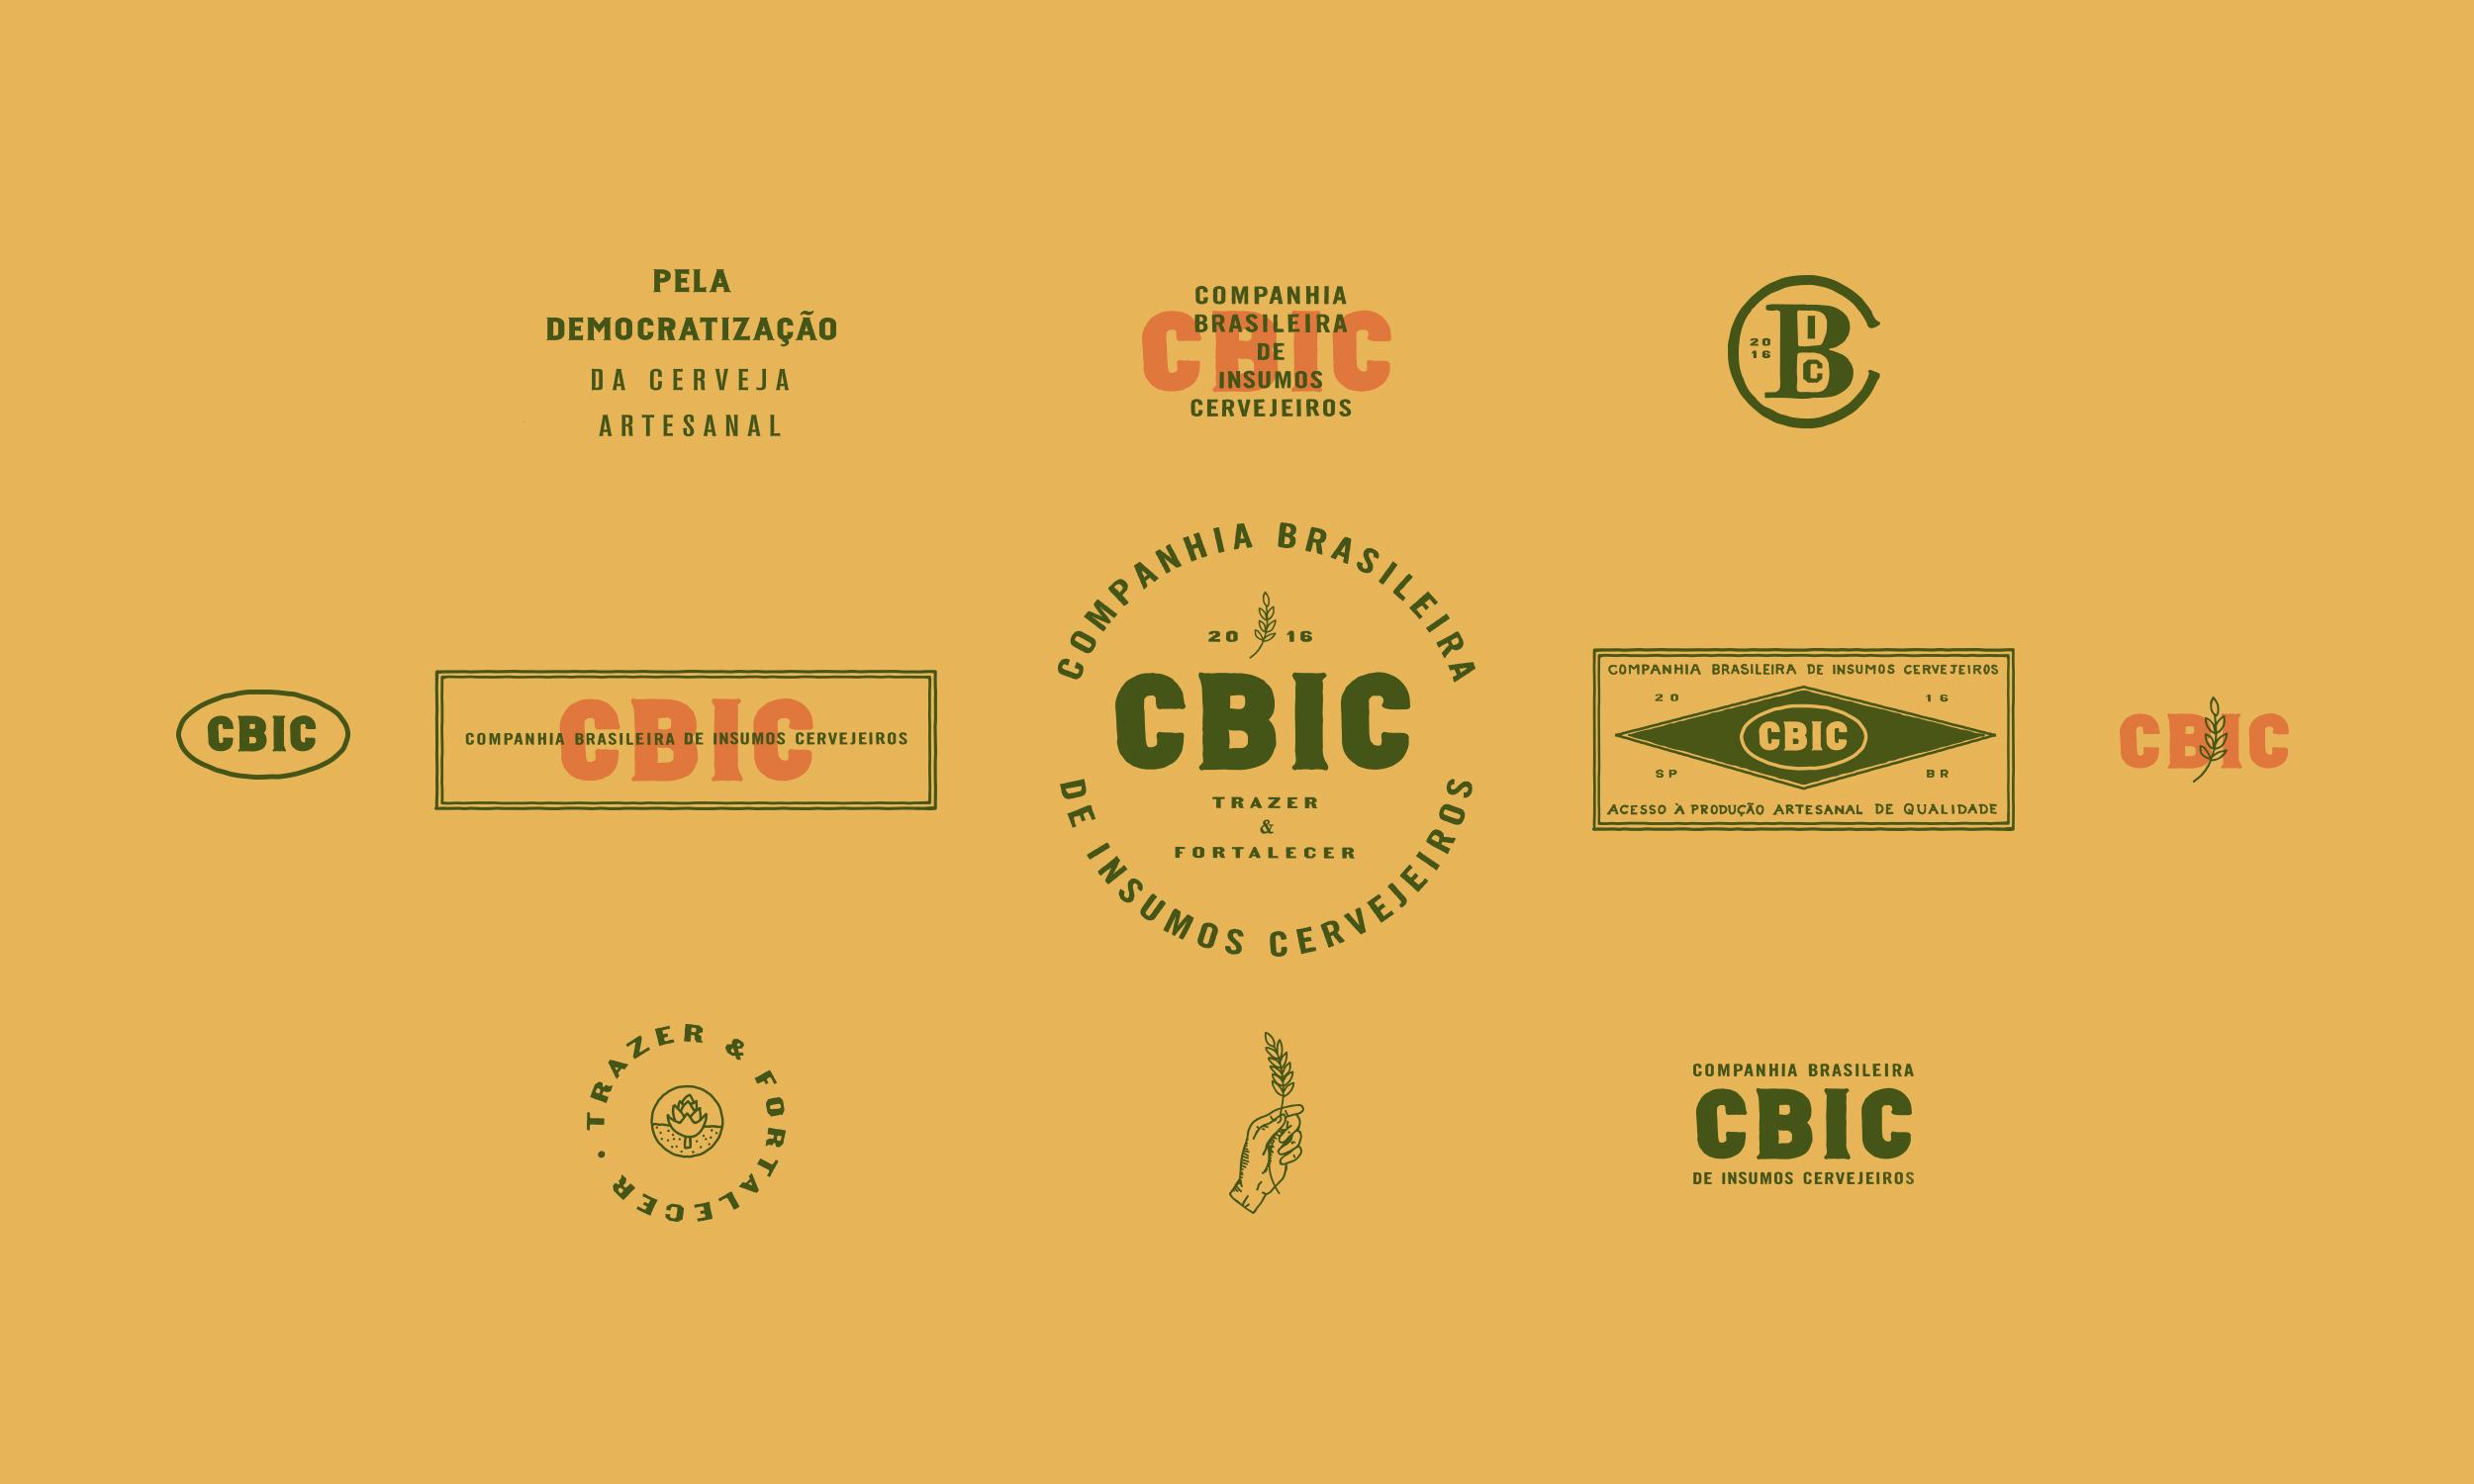 cbic_full